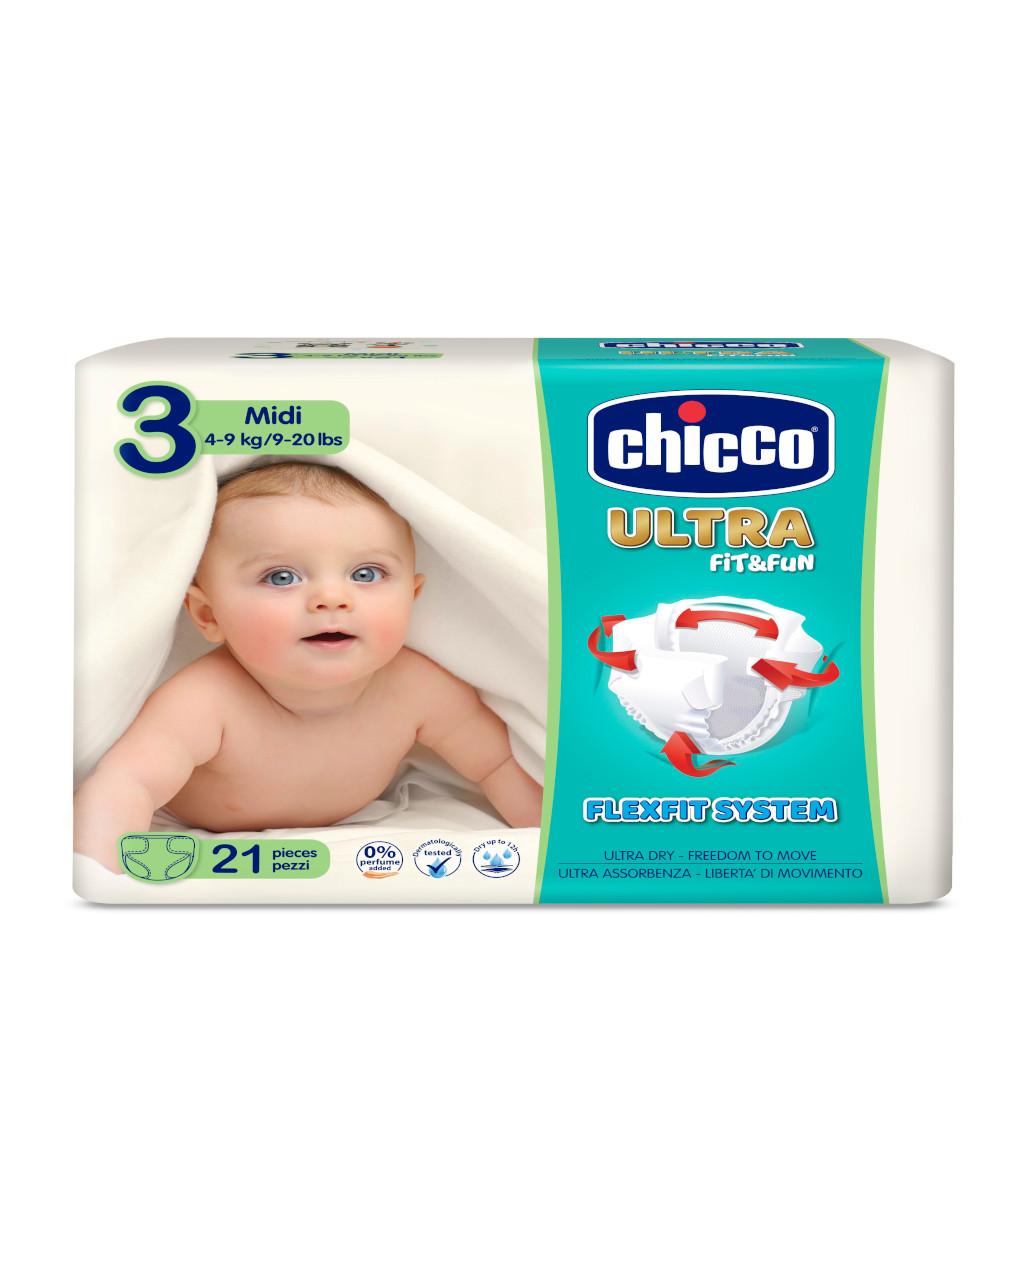 Chicco - pannolini ultra soft tg. 3 (4-9 kg) - pacco singolo 21 pz - Chicco